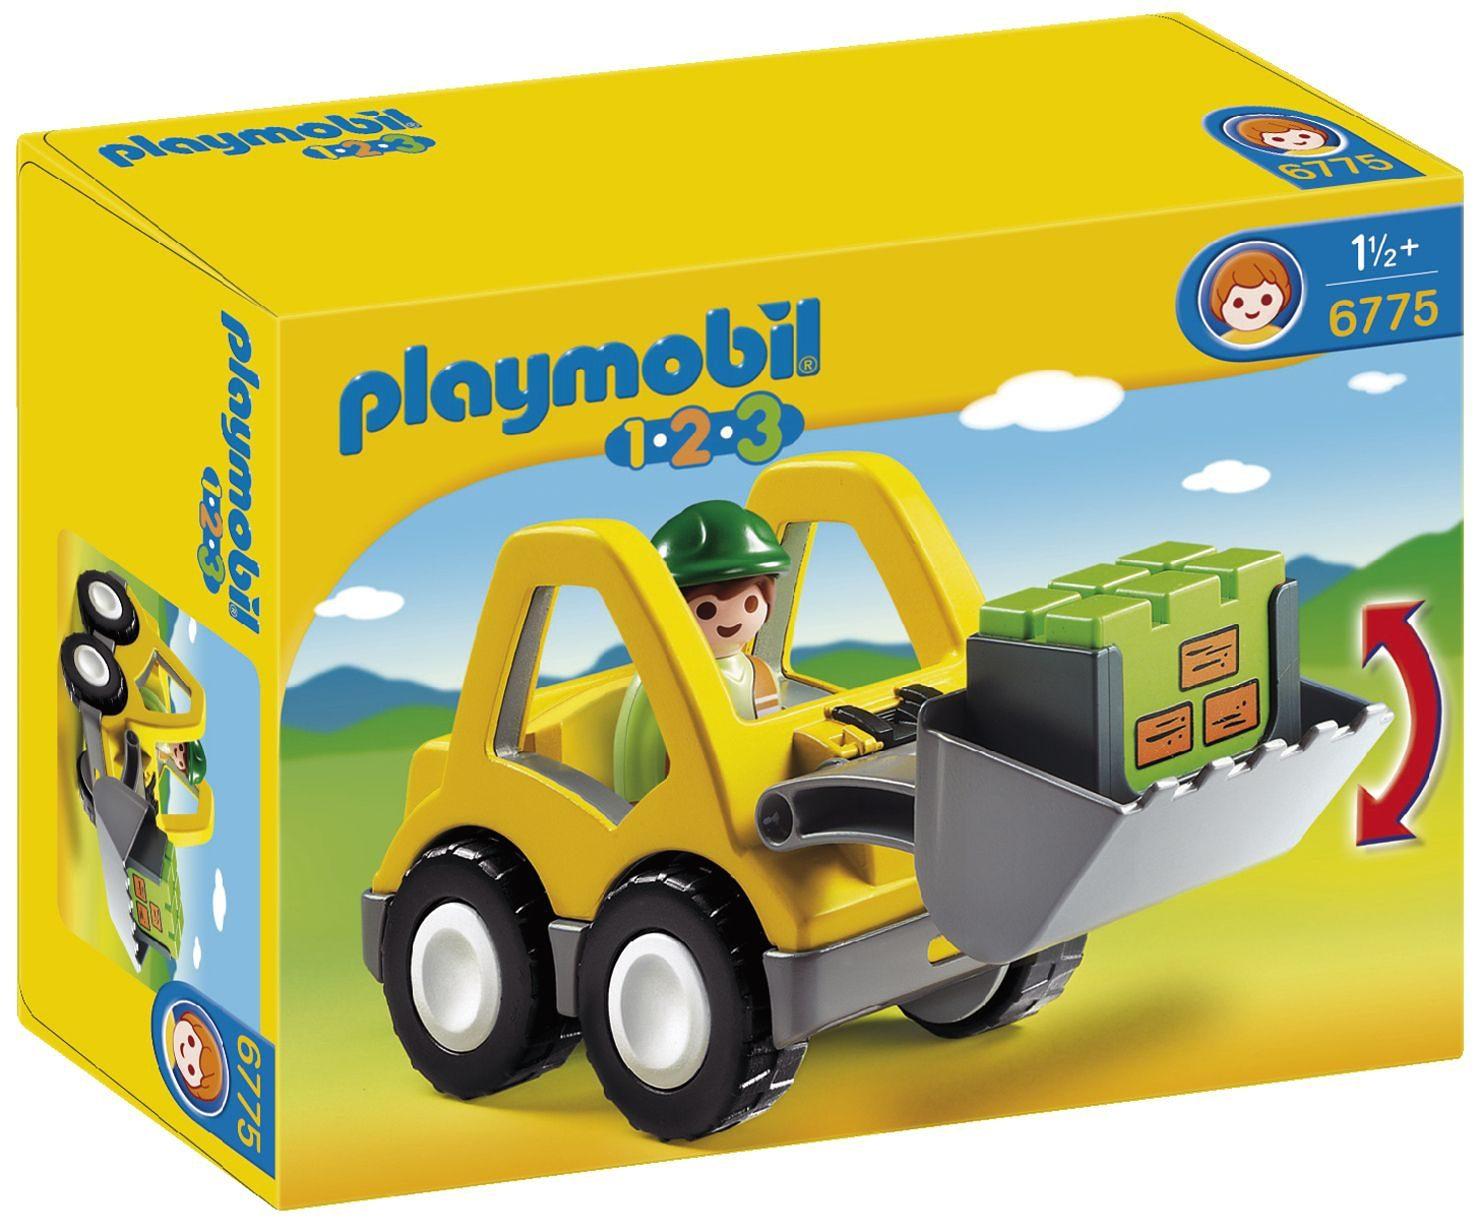 Playmobil® Radlader (6775), Playmobil 1-2-3